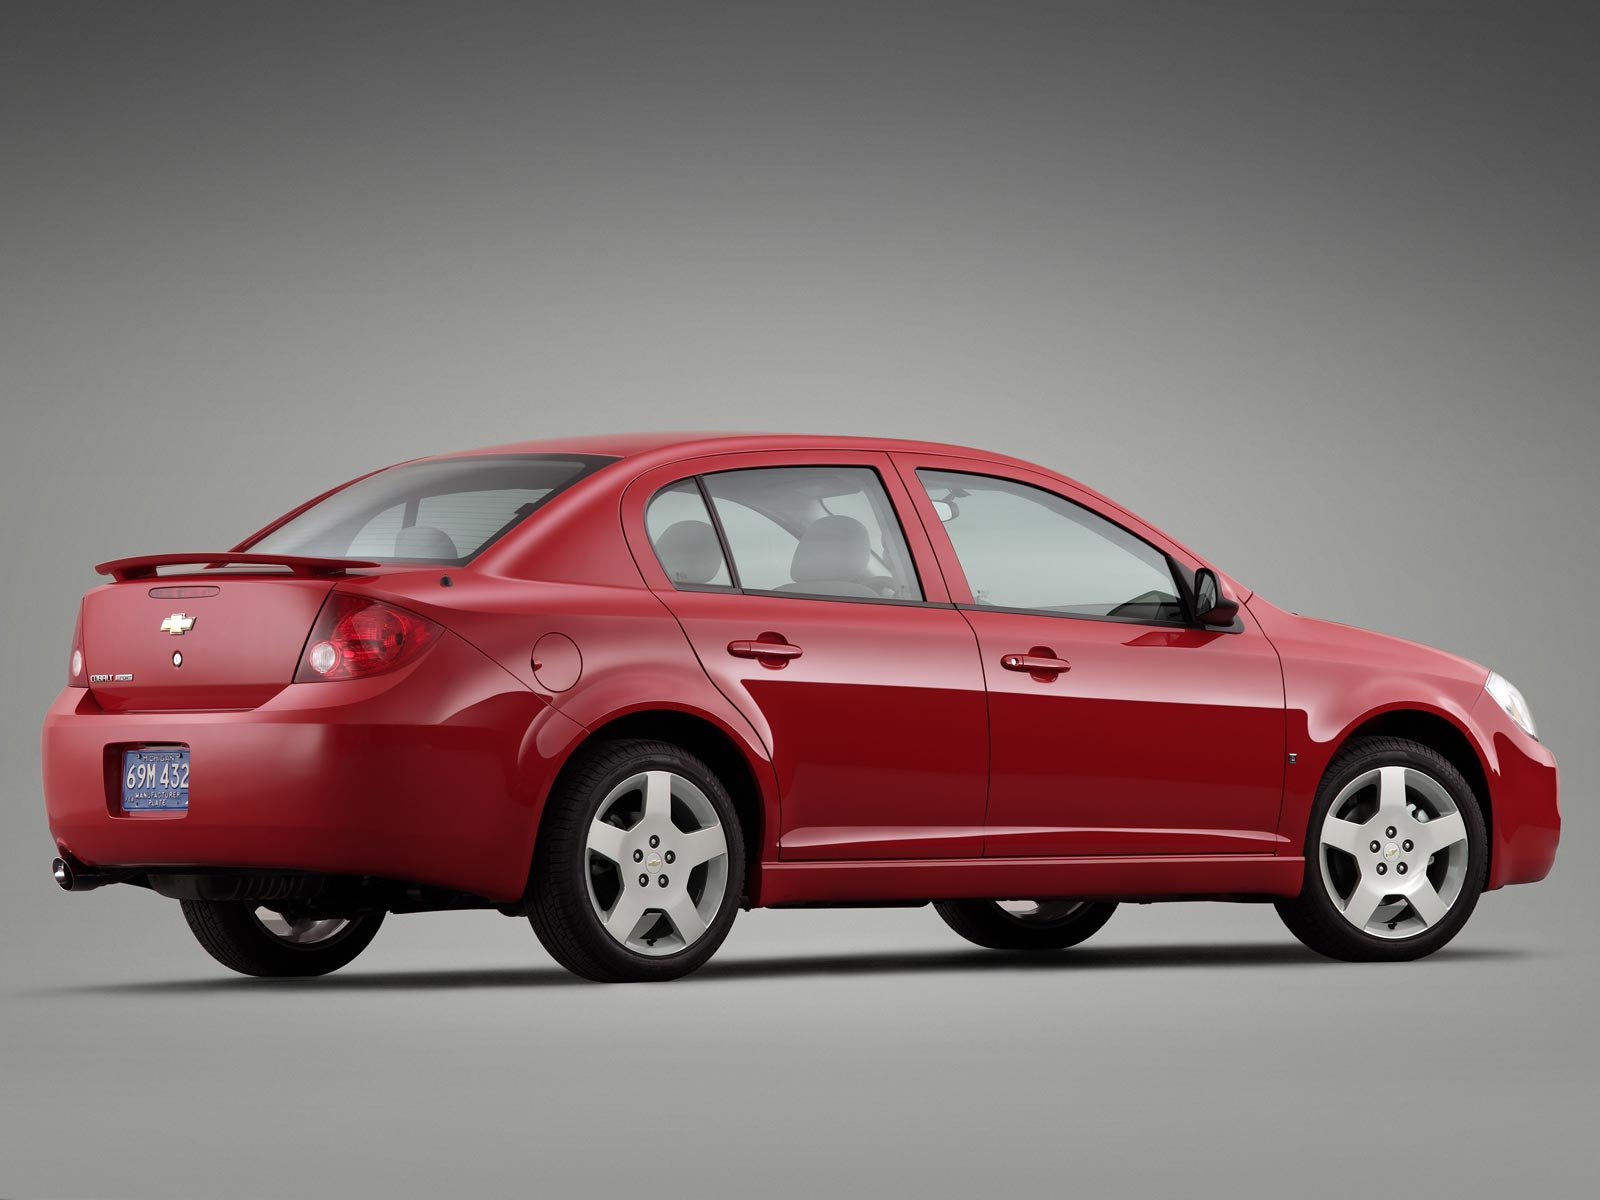 2005 2010 Chevrolet Cobalt Autoguru Katalog At